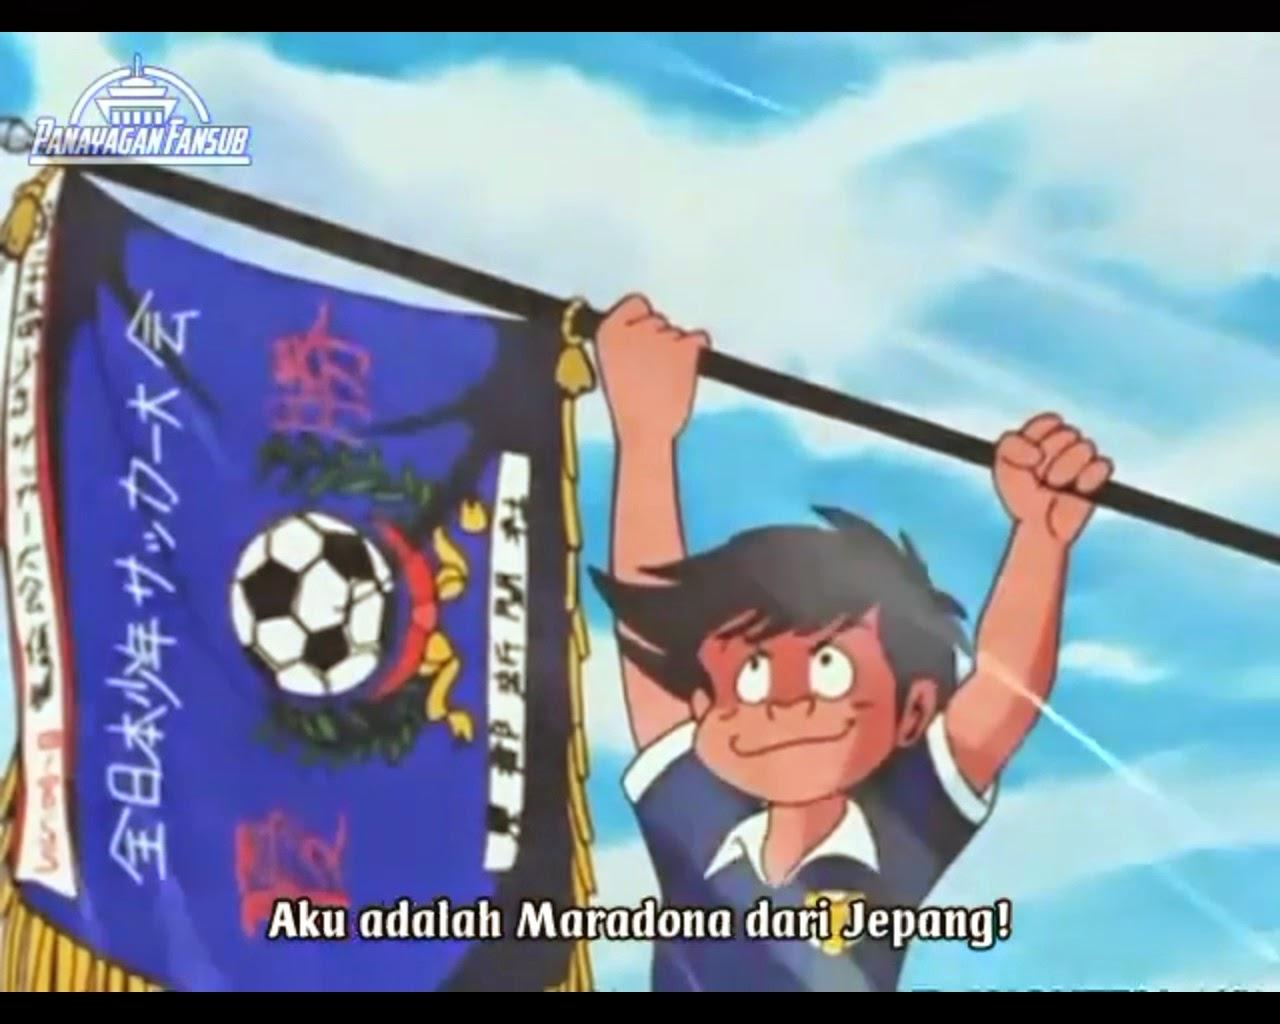 Download Ganbare! Kickers Episode 08 Subtitle Indonesia